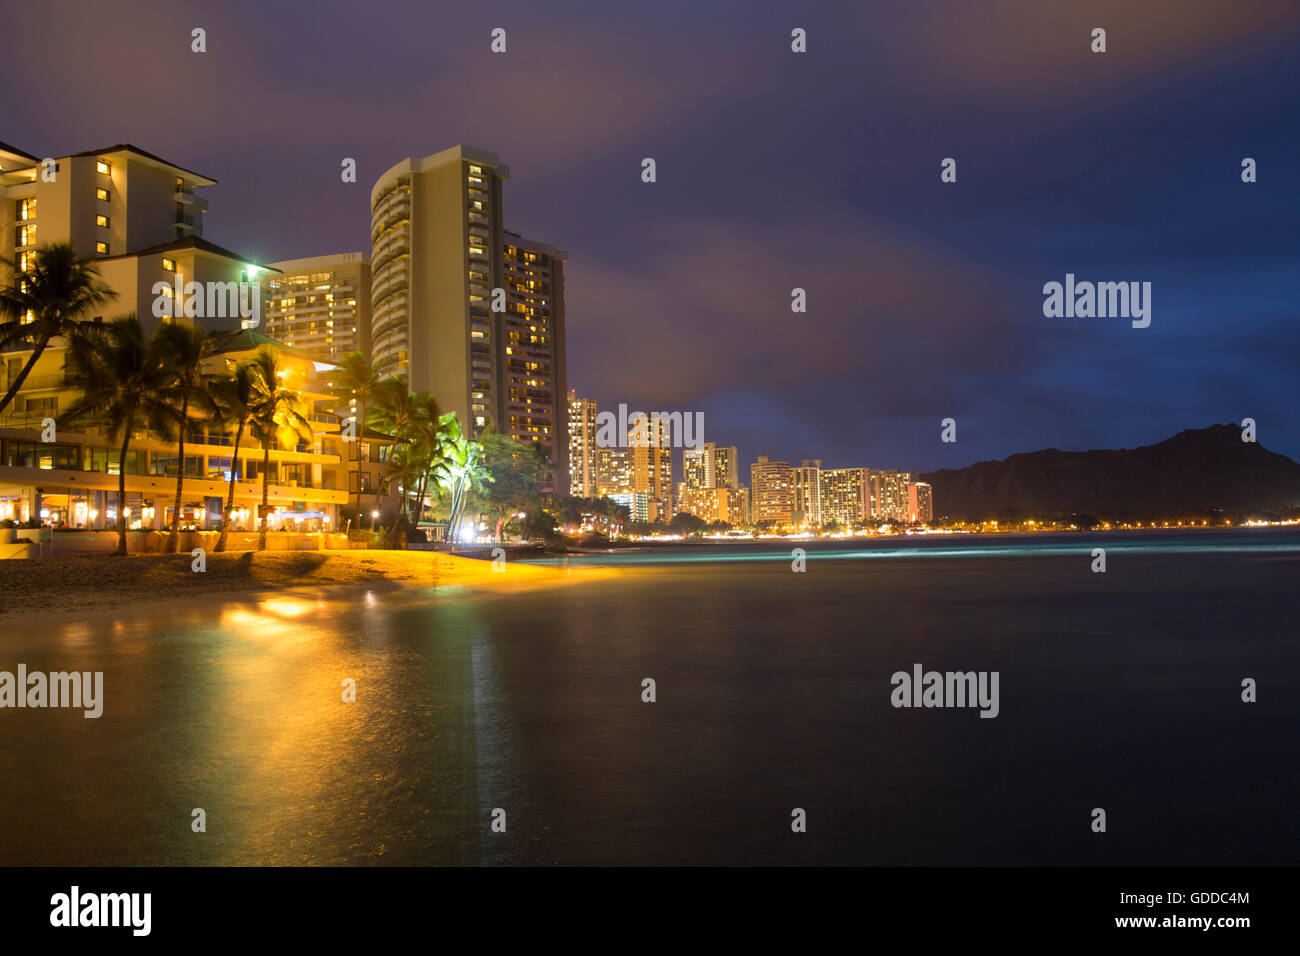 Honolulu, Oahu, Hauptstadt, Waikiki Beach, USA, Hawaii, Amerika, Stadt, Stadt, Abend, Stockbild